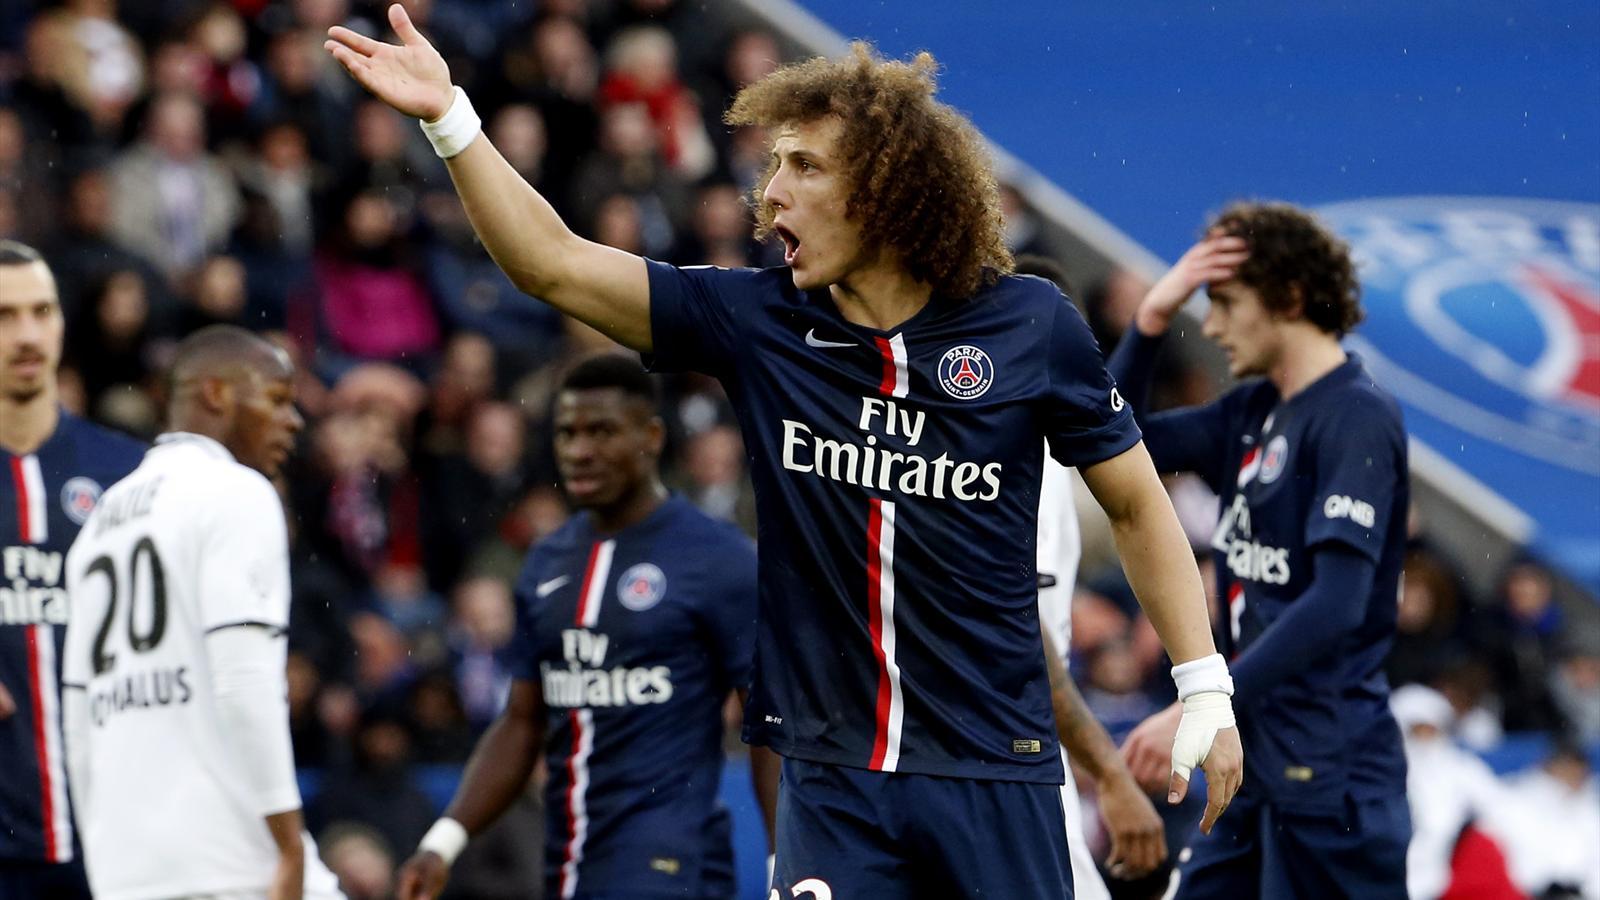 David Luiz lors de PSG-Caen (saison 2014-2015)